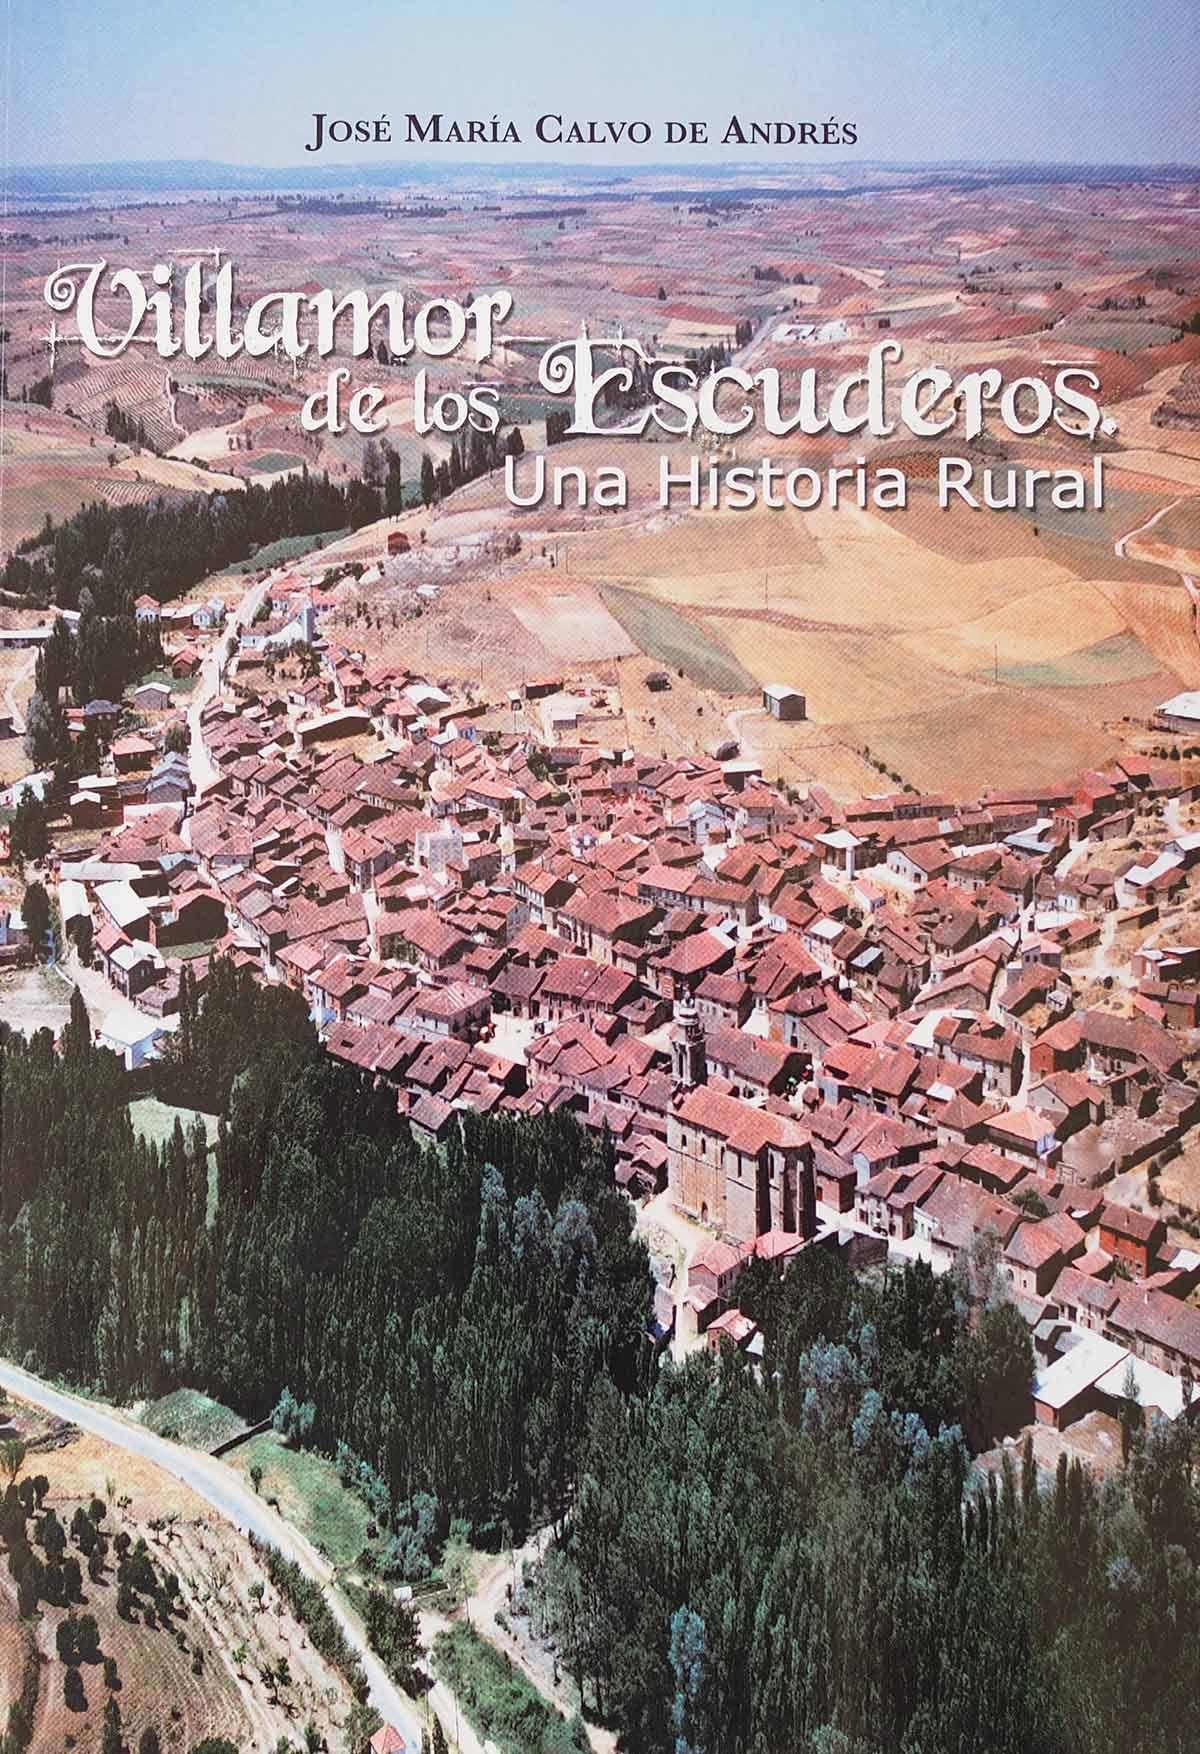 villamor-escuderos-jose-maria-calvo-andres-editorial-semuret